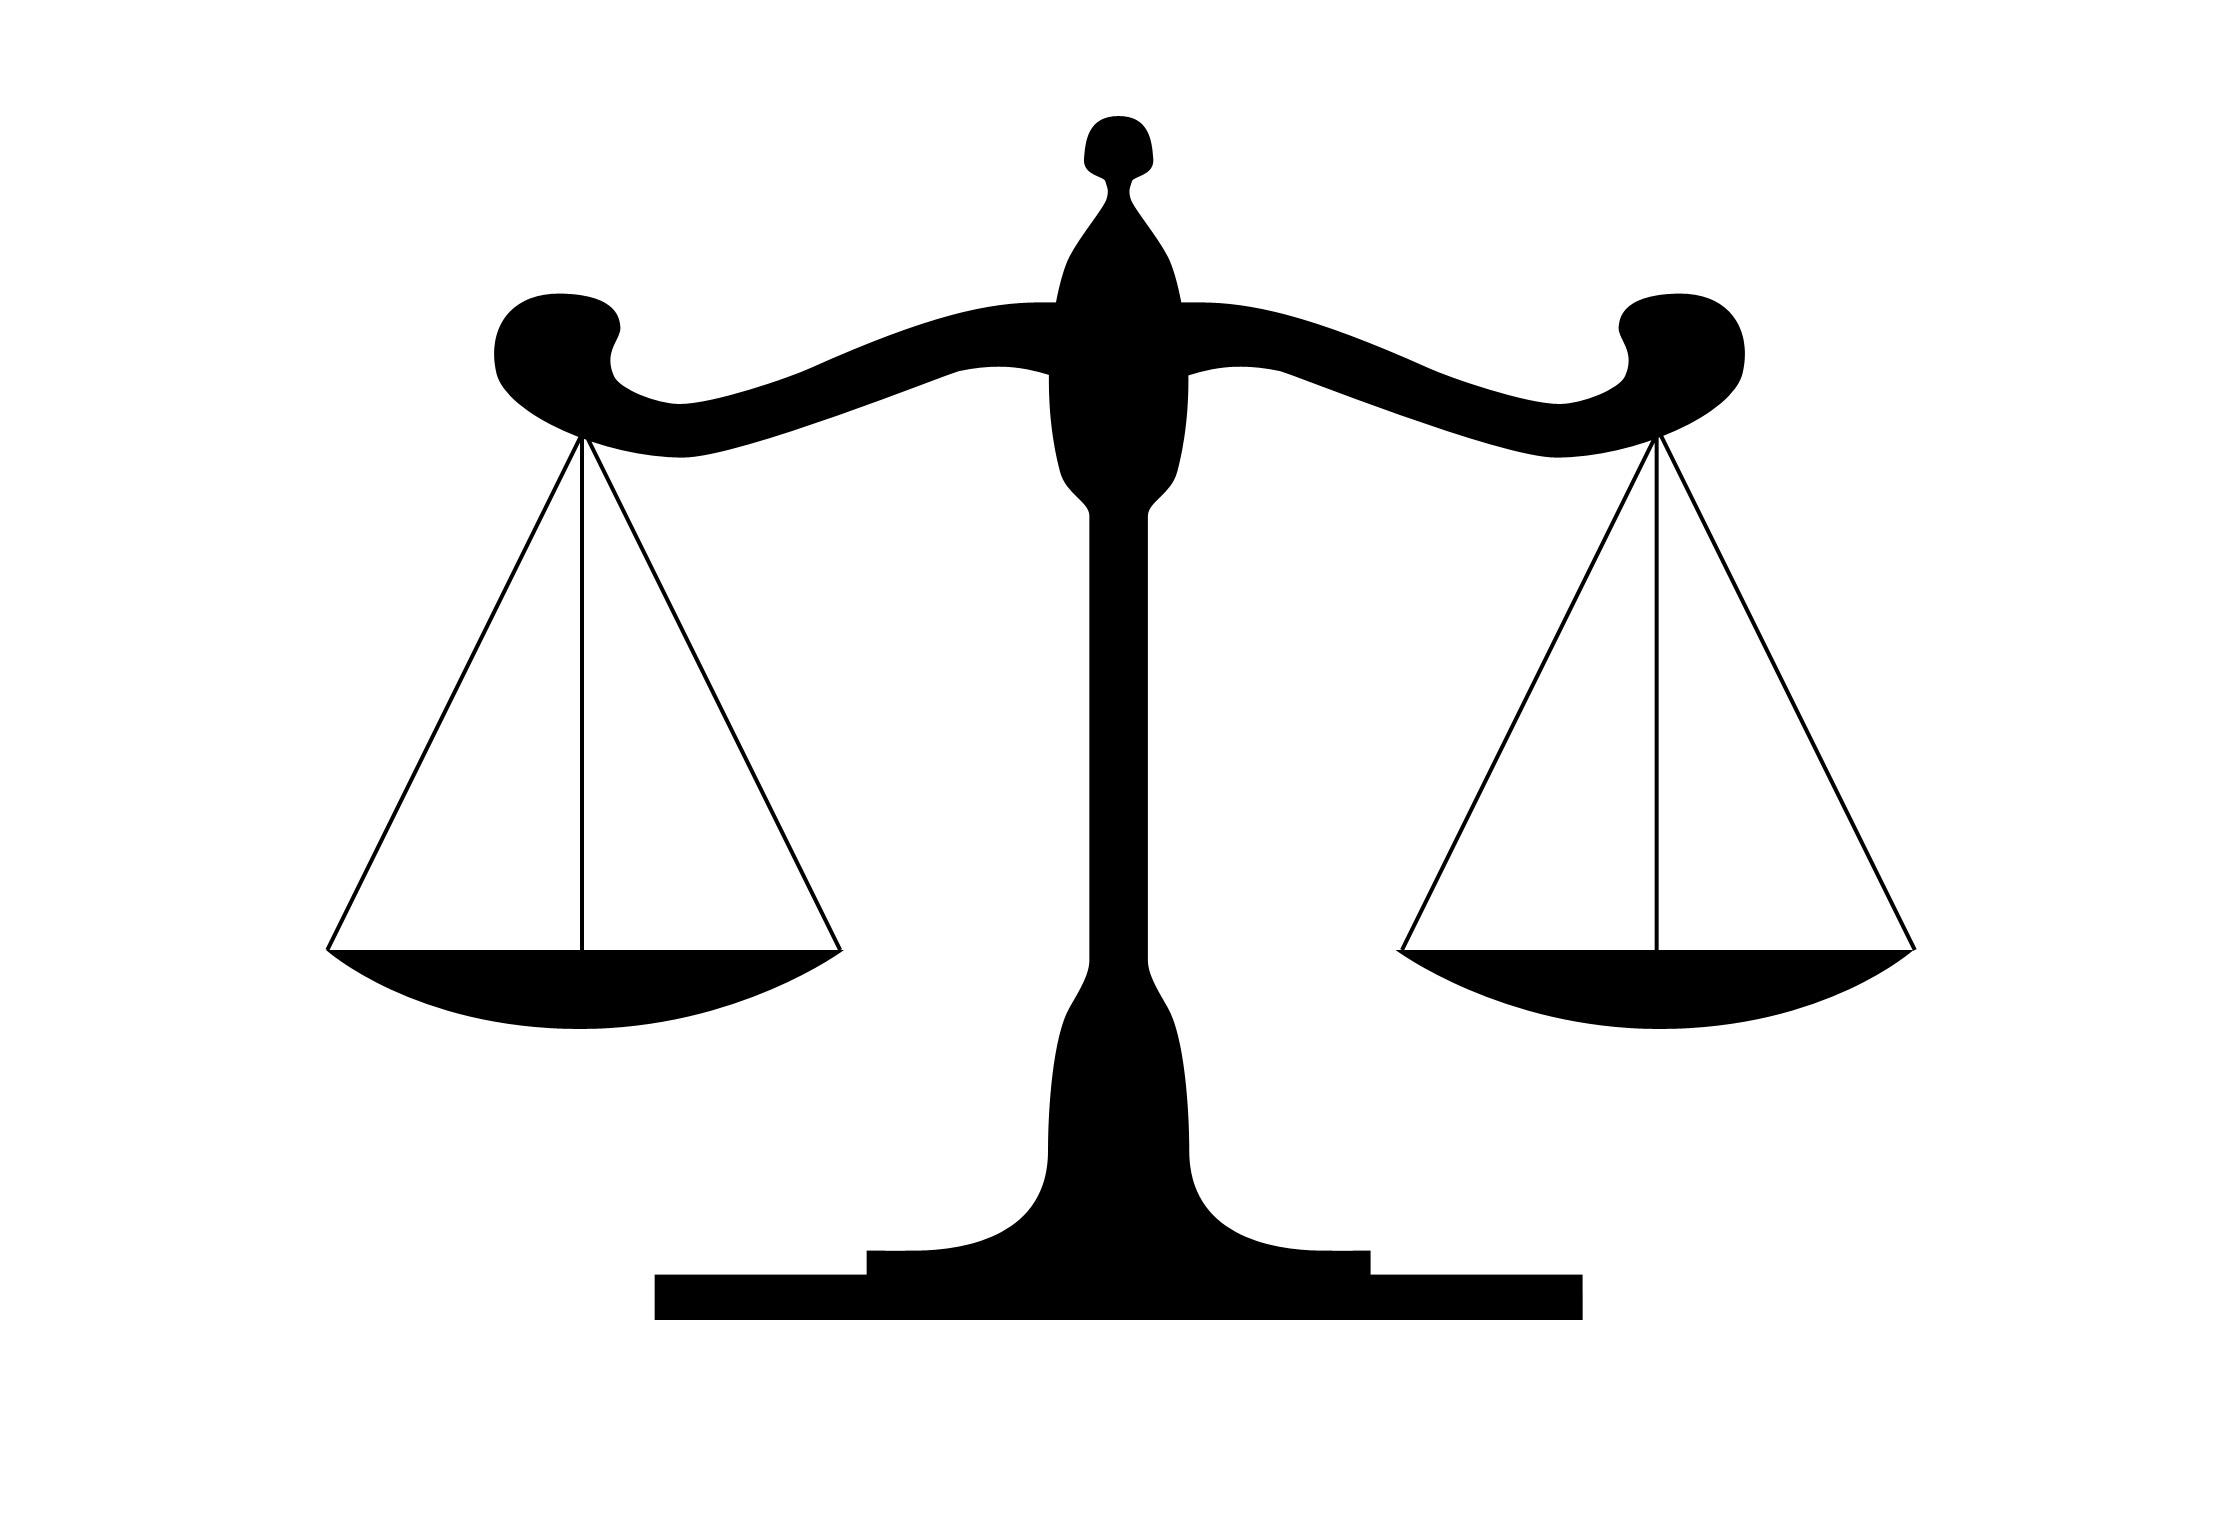 Justice Scale Clip Art